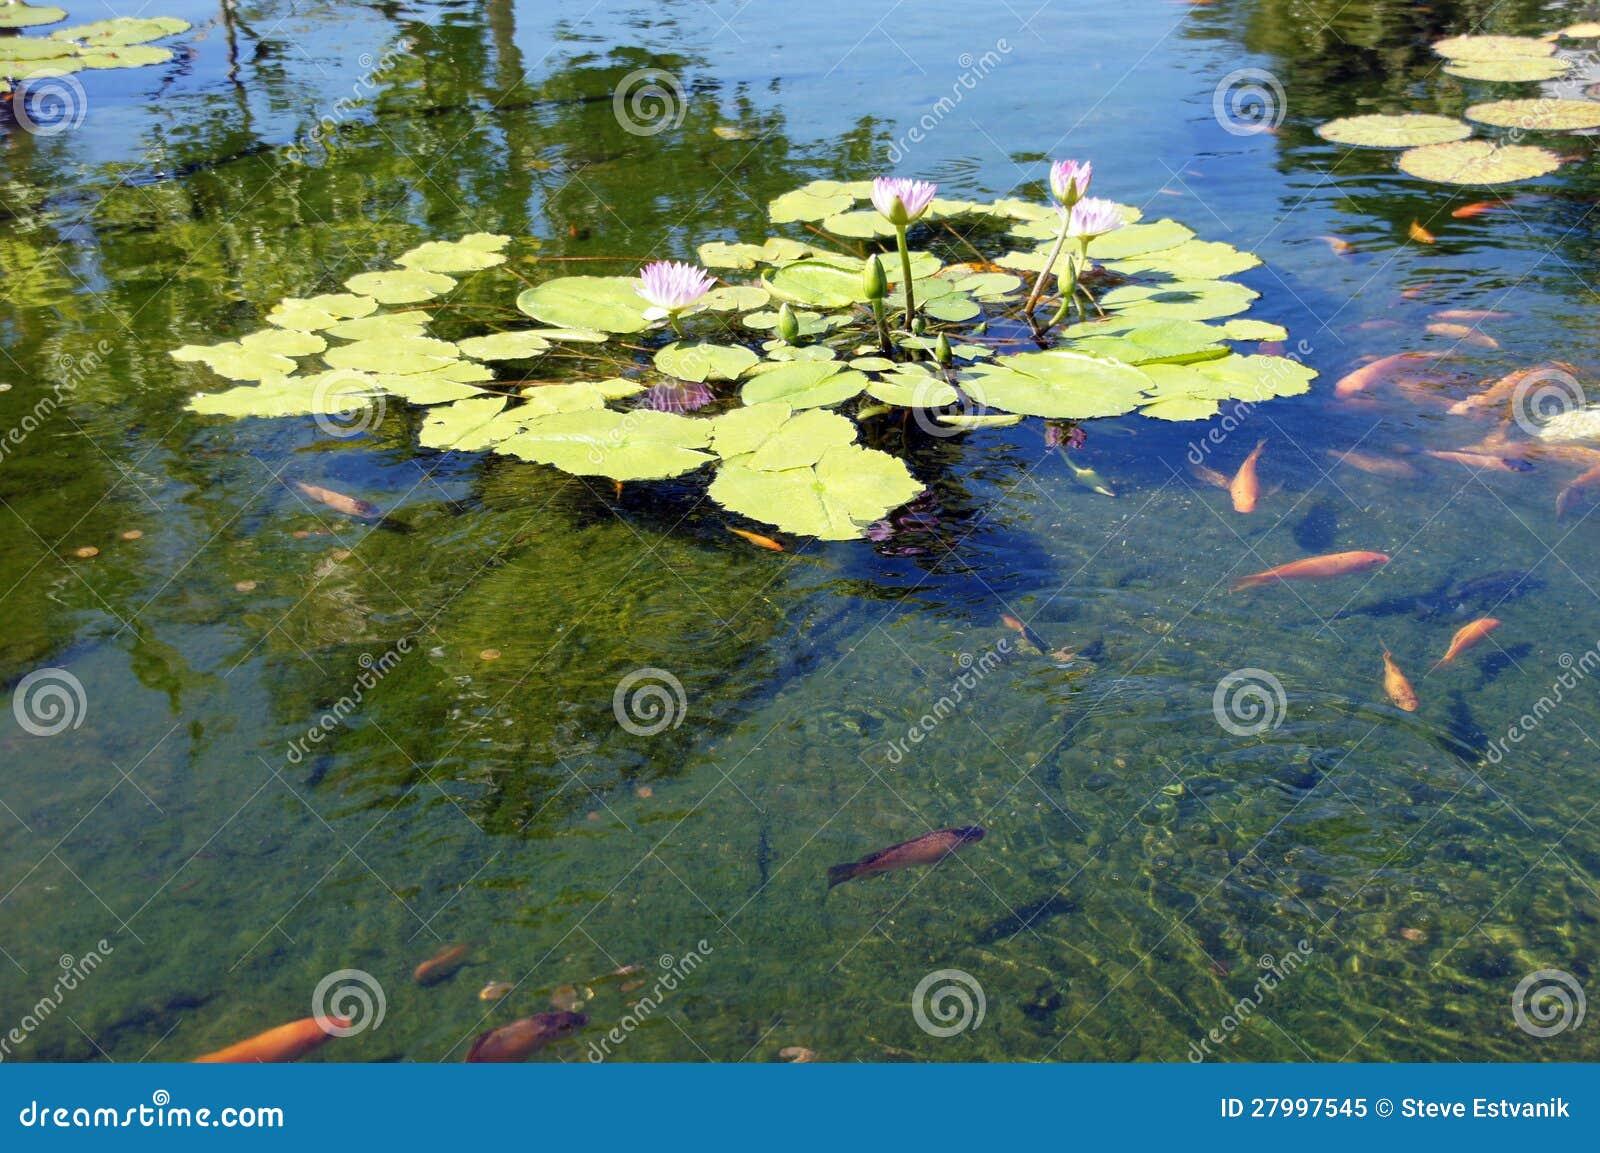 Koi carp swimming in shallow pool royalty free stock photo for Koi carp pool design